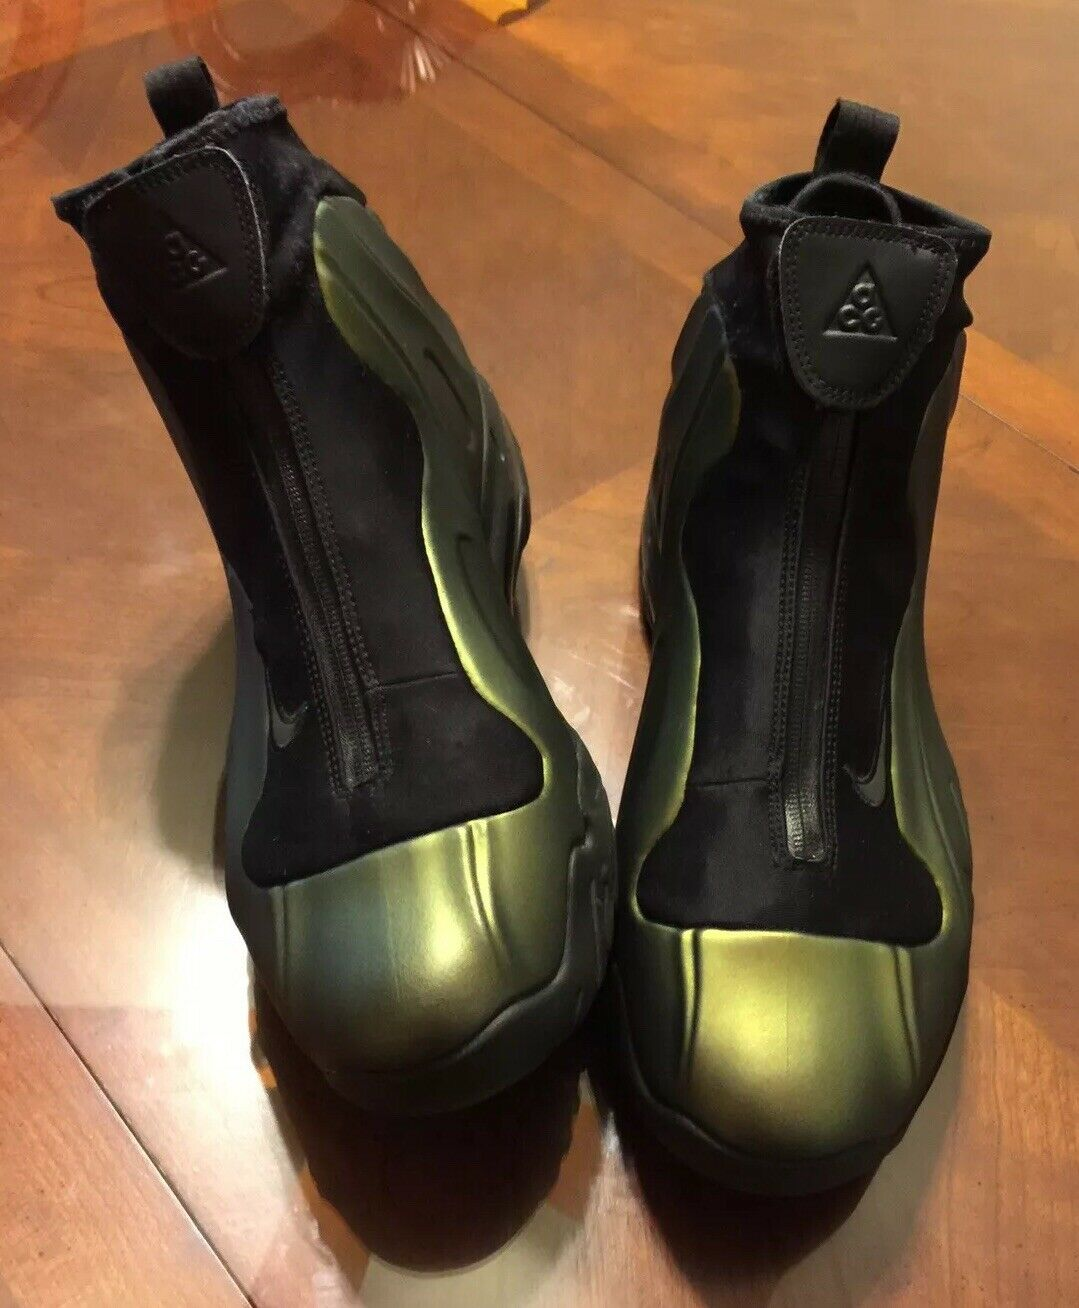 Nike i95 Flightposite Foamposite Foamposite Foamposite Boots Posite Metallic gold Sz 10 RARE 18a351